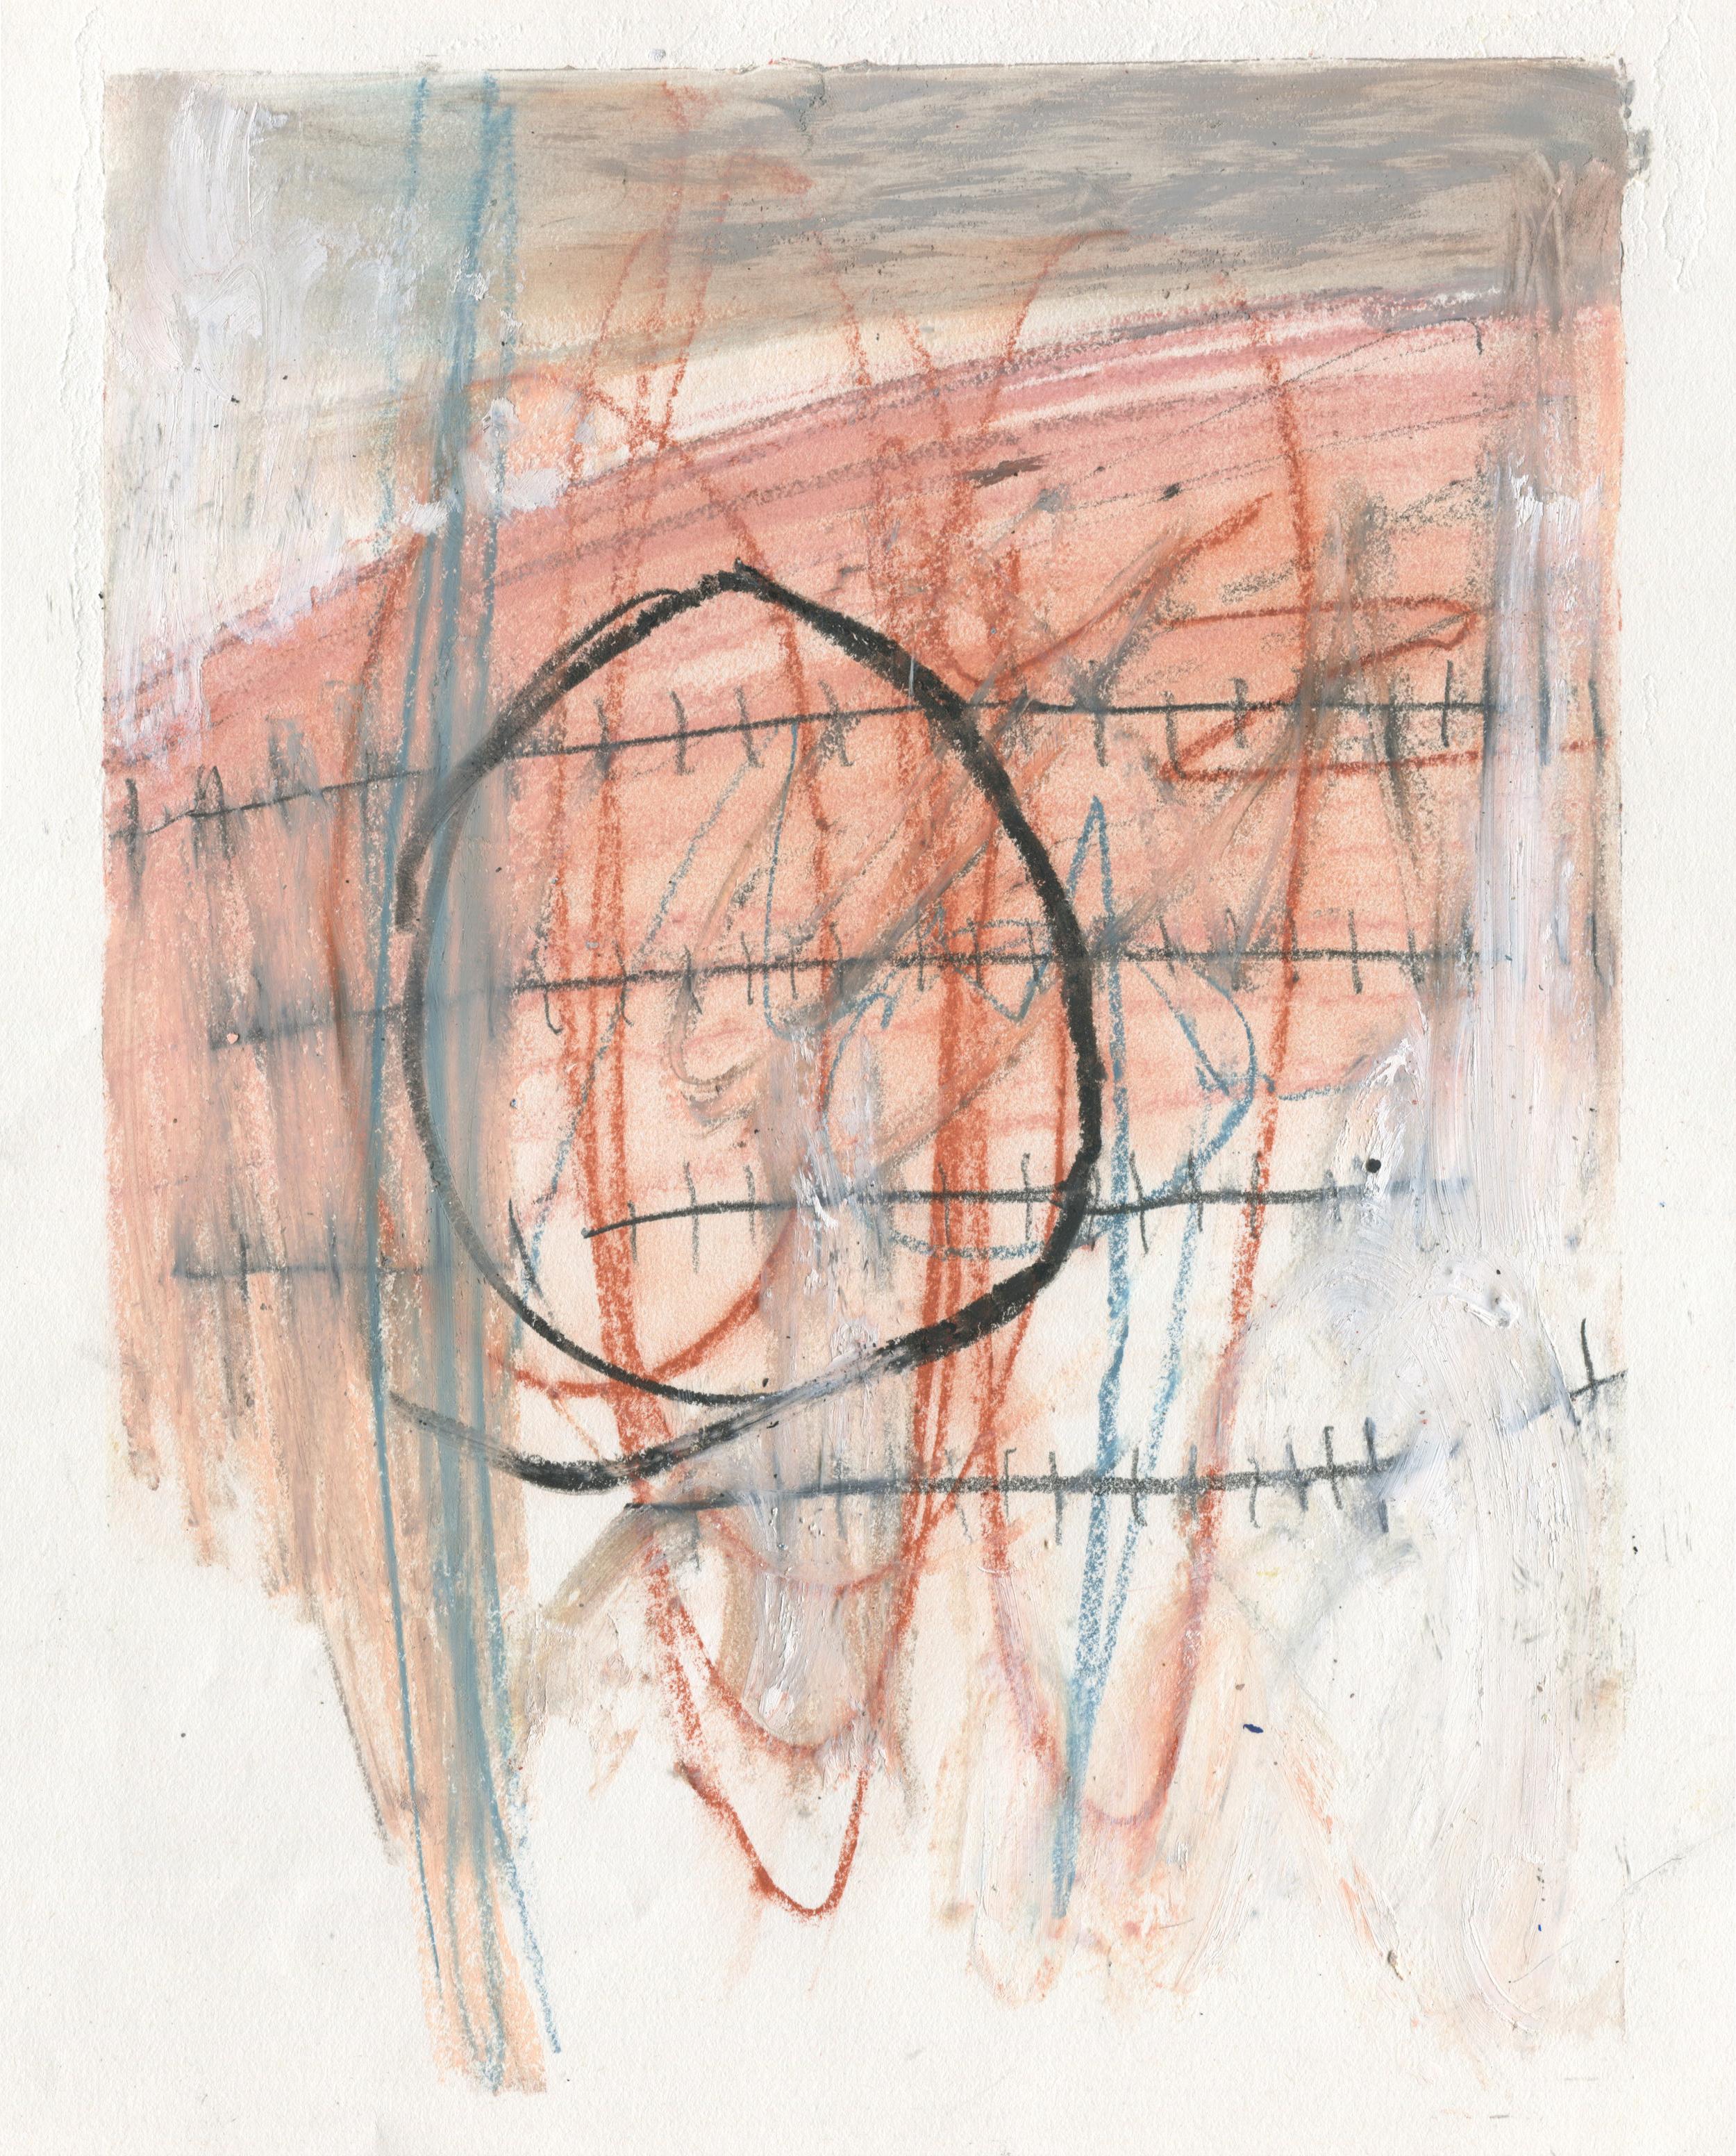 Periodicity , 2016  14 x 11 inches  Crayon, Oil Pastel, Conte Crayon, Graphite and Oil Stick on Paper